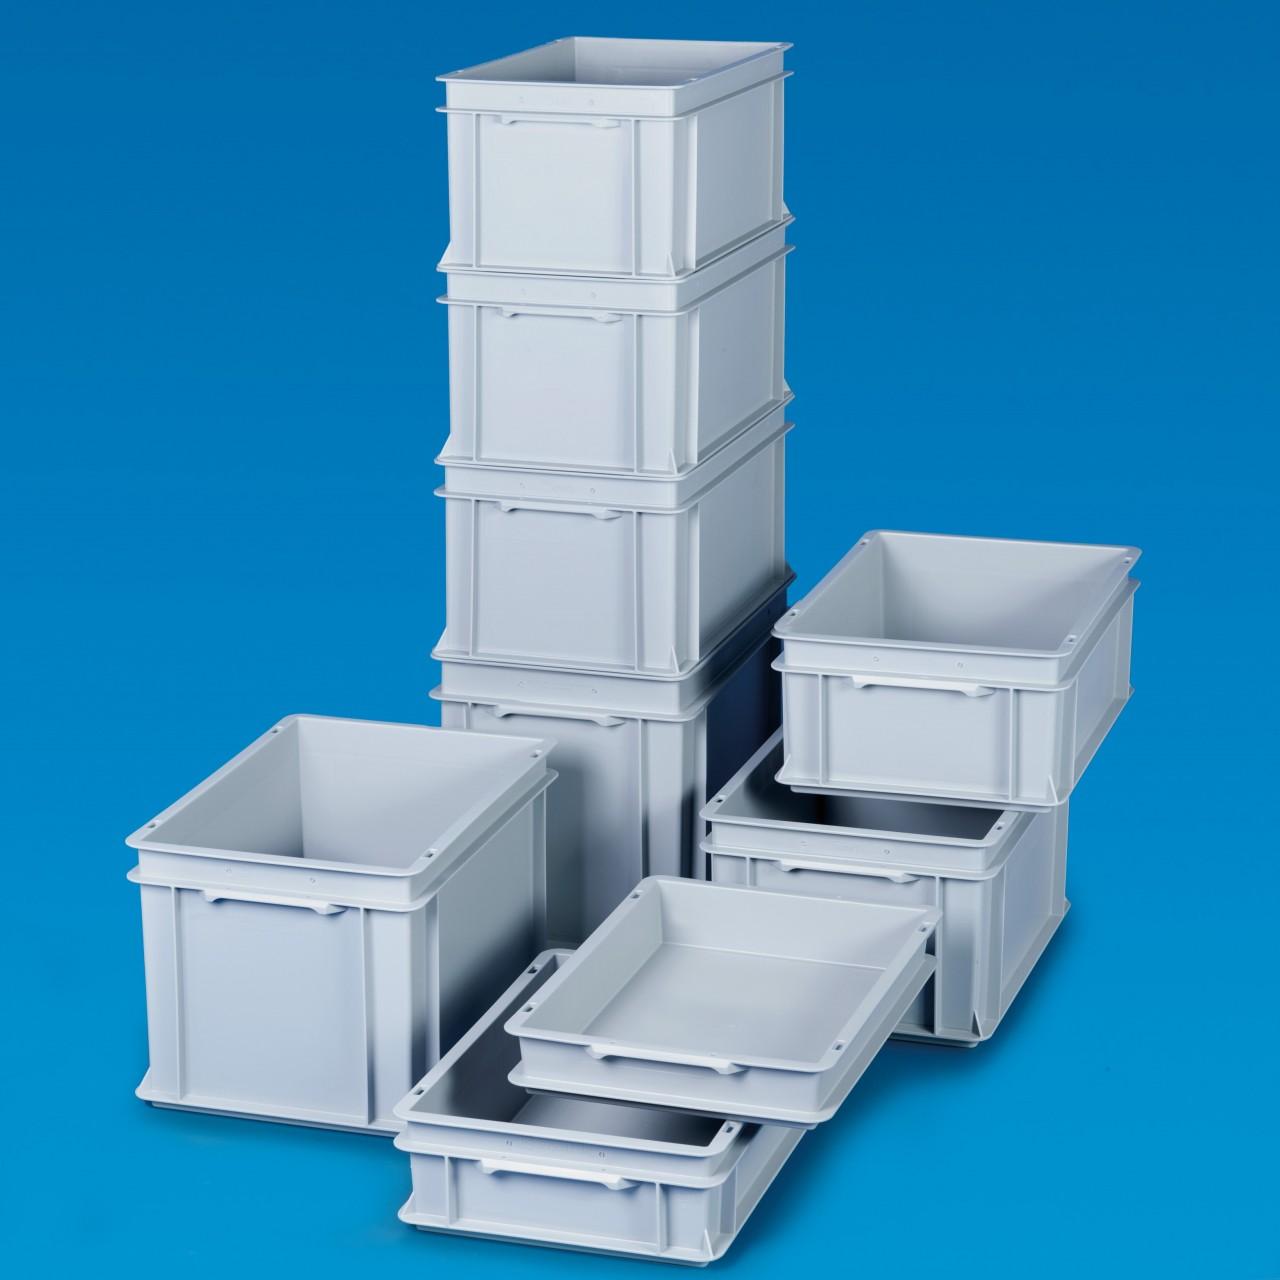 Rako-Behälter |Grundfläche 400 x 300 mm